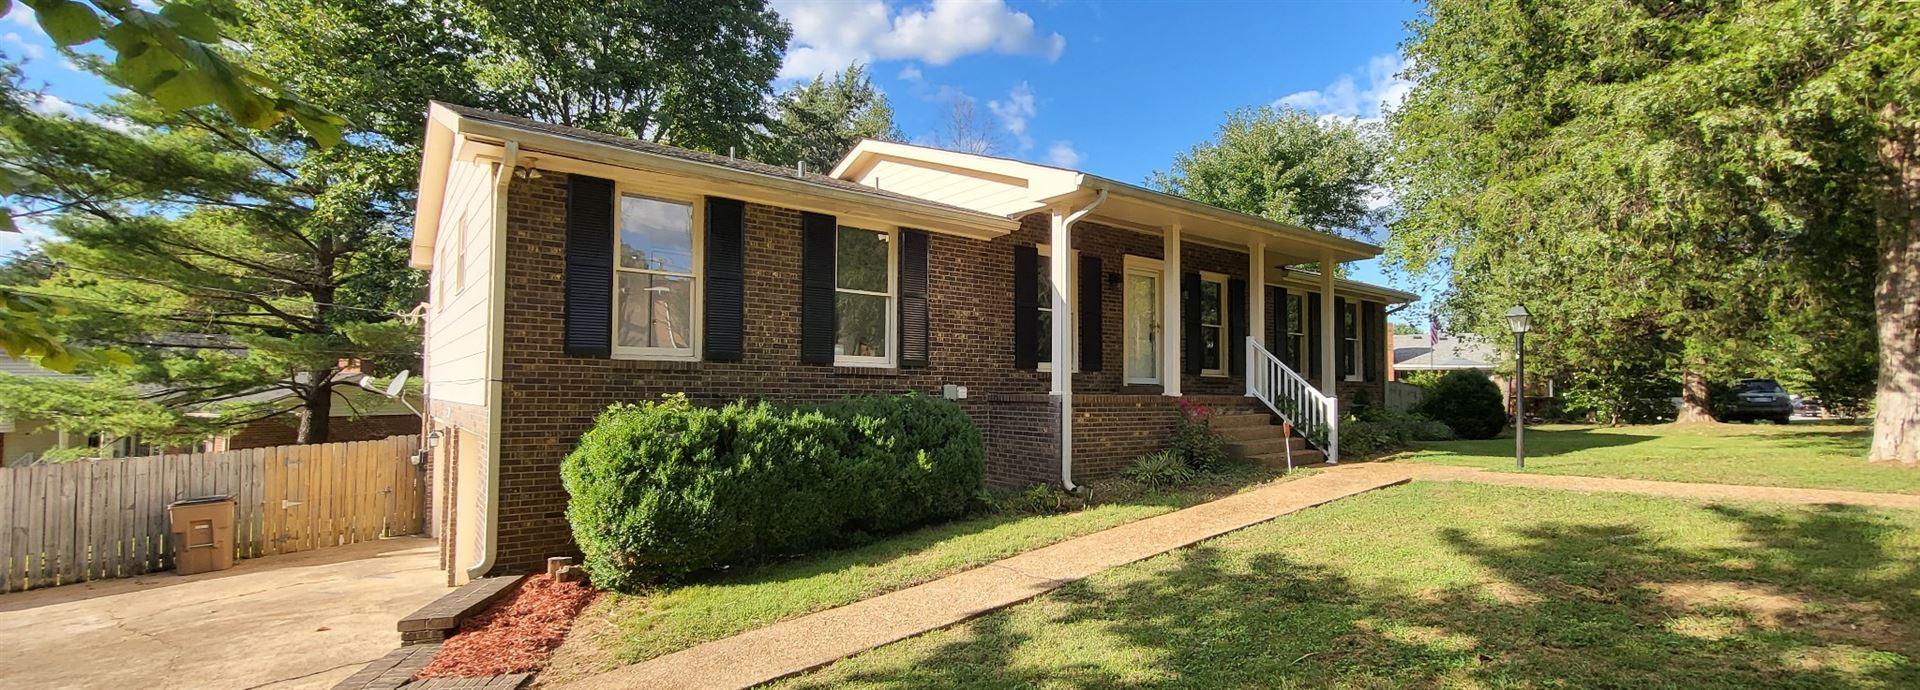 3824 Priest Lake Dr, Nashville, TN 37217 - MLS#: 2290147